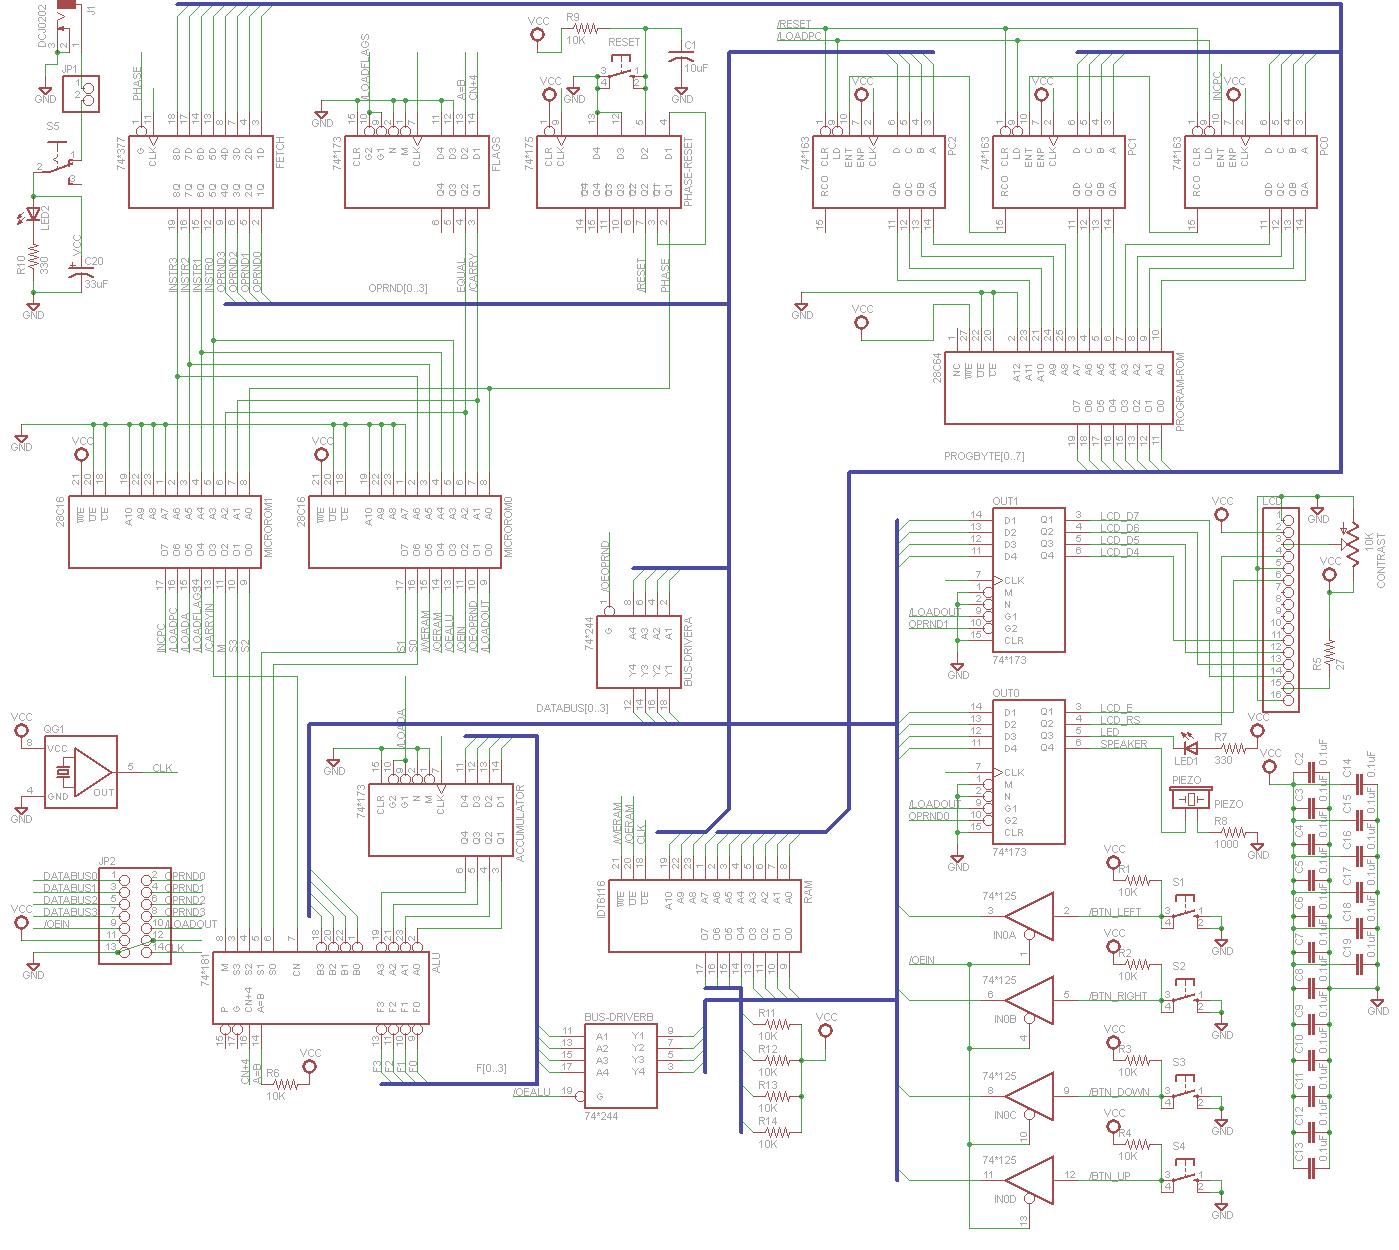 processor schematic #15